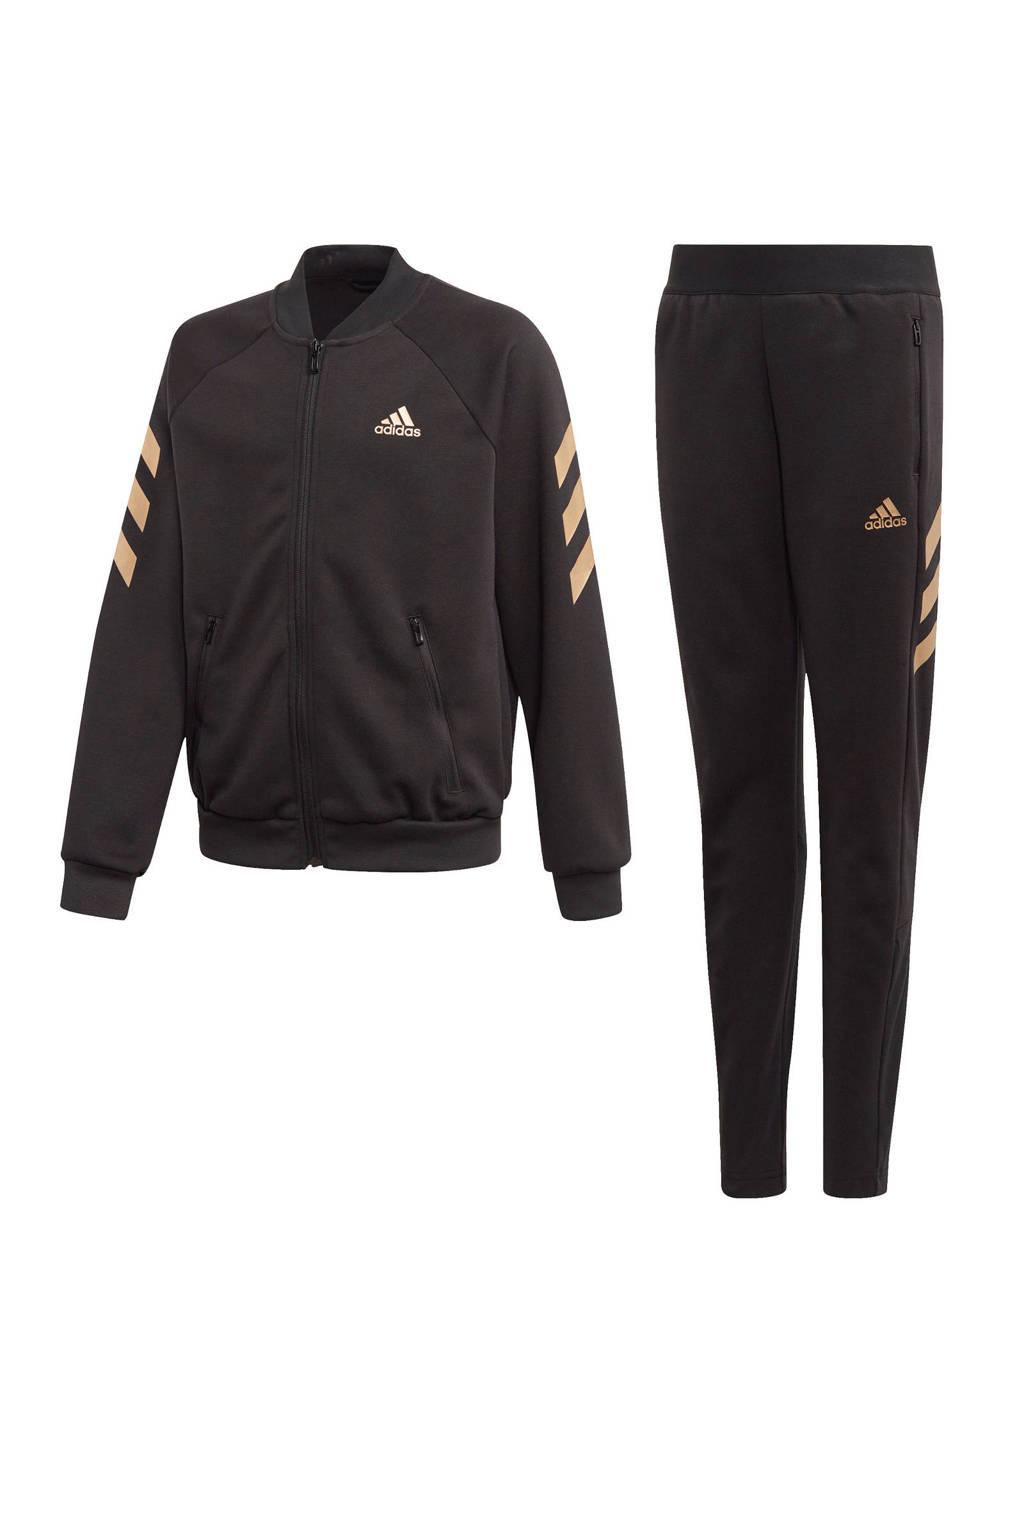 adidas Performance trainingspak zwart/goud, Zwart/goud